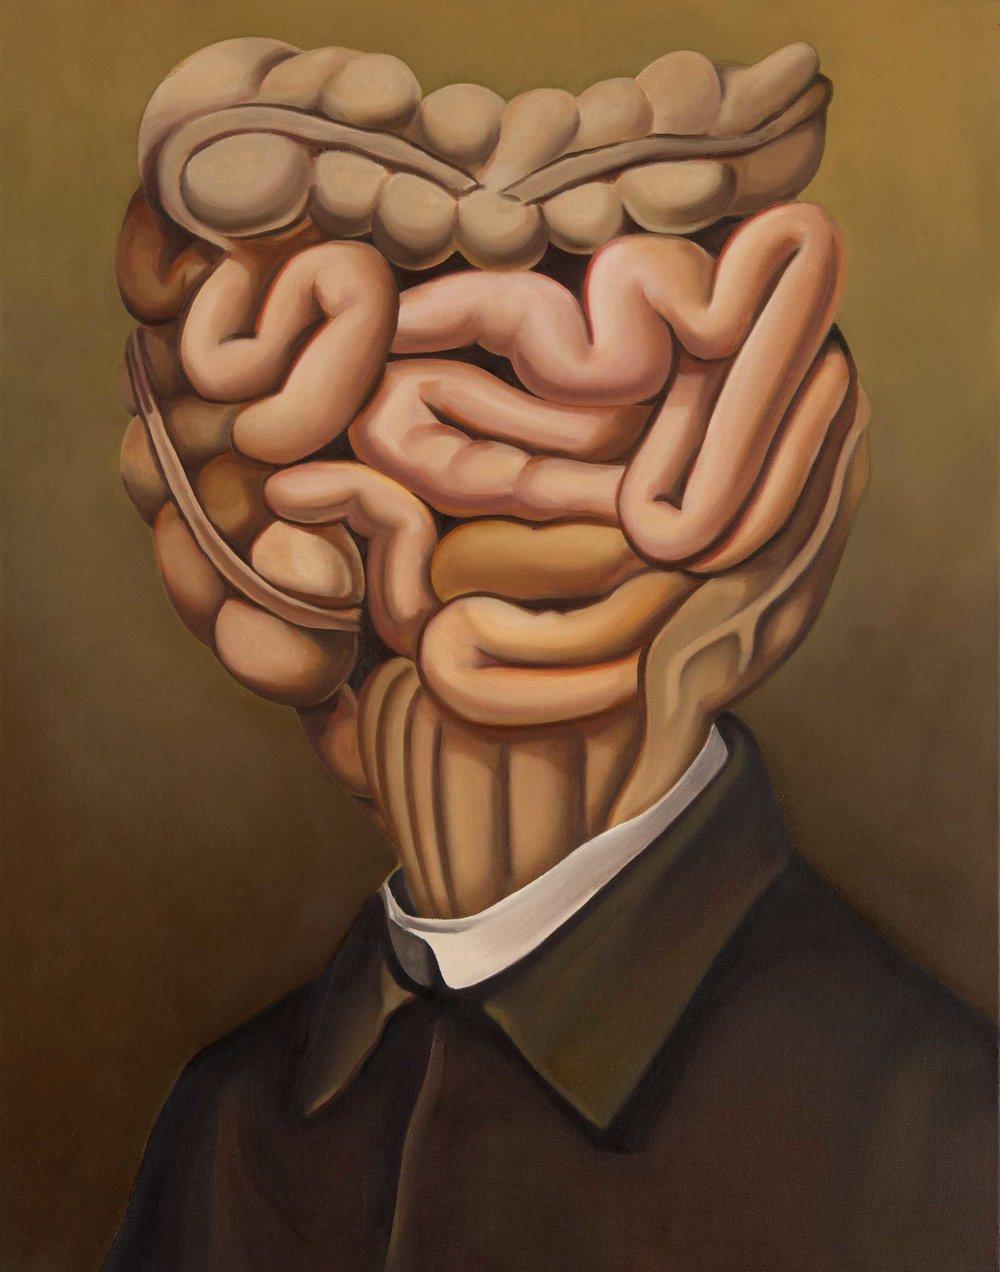 Victorian Freak , 2014. Oil on canvas, 70 x 55 cm.